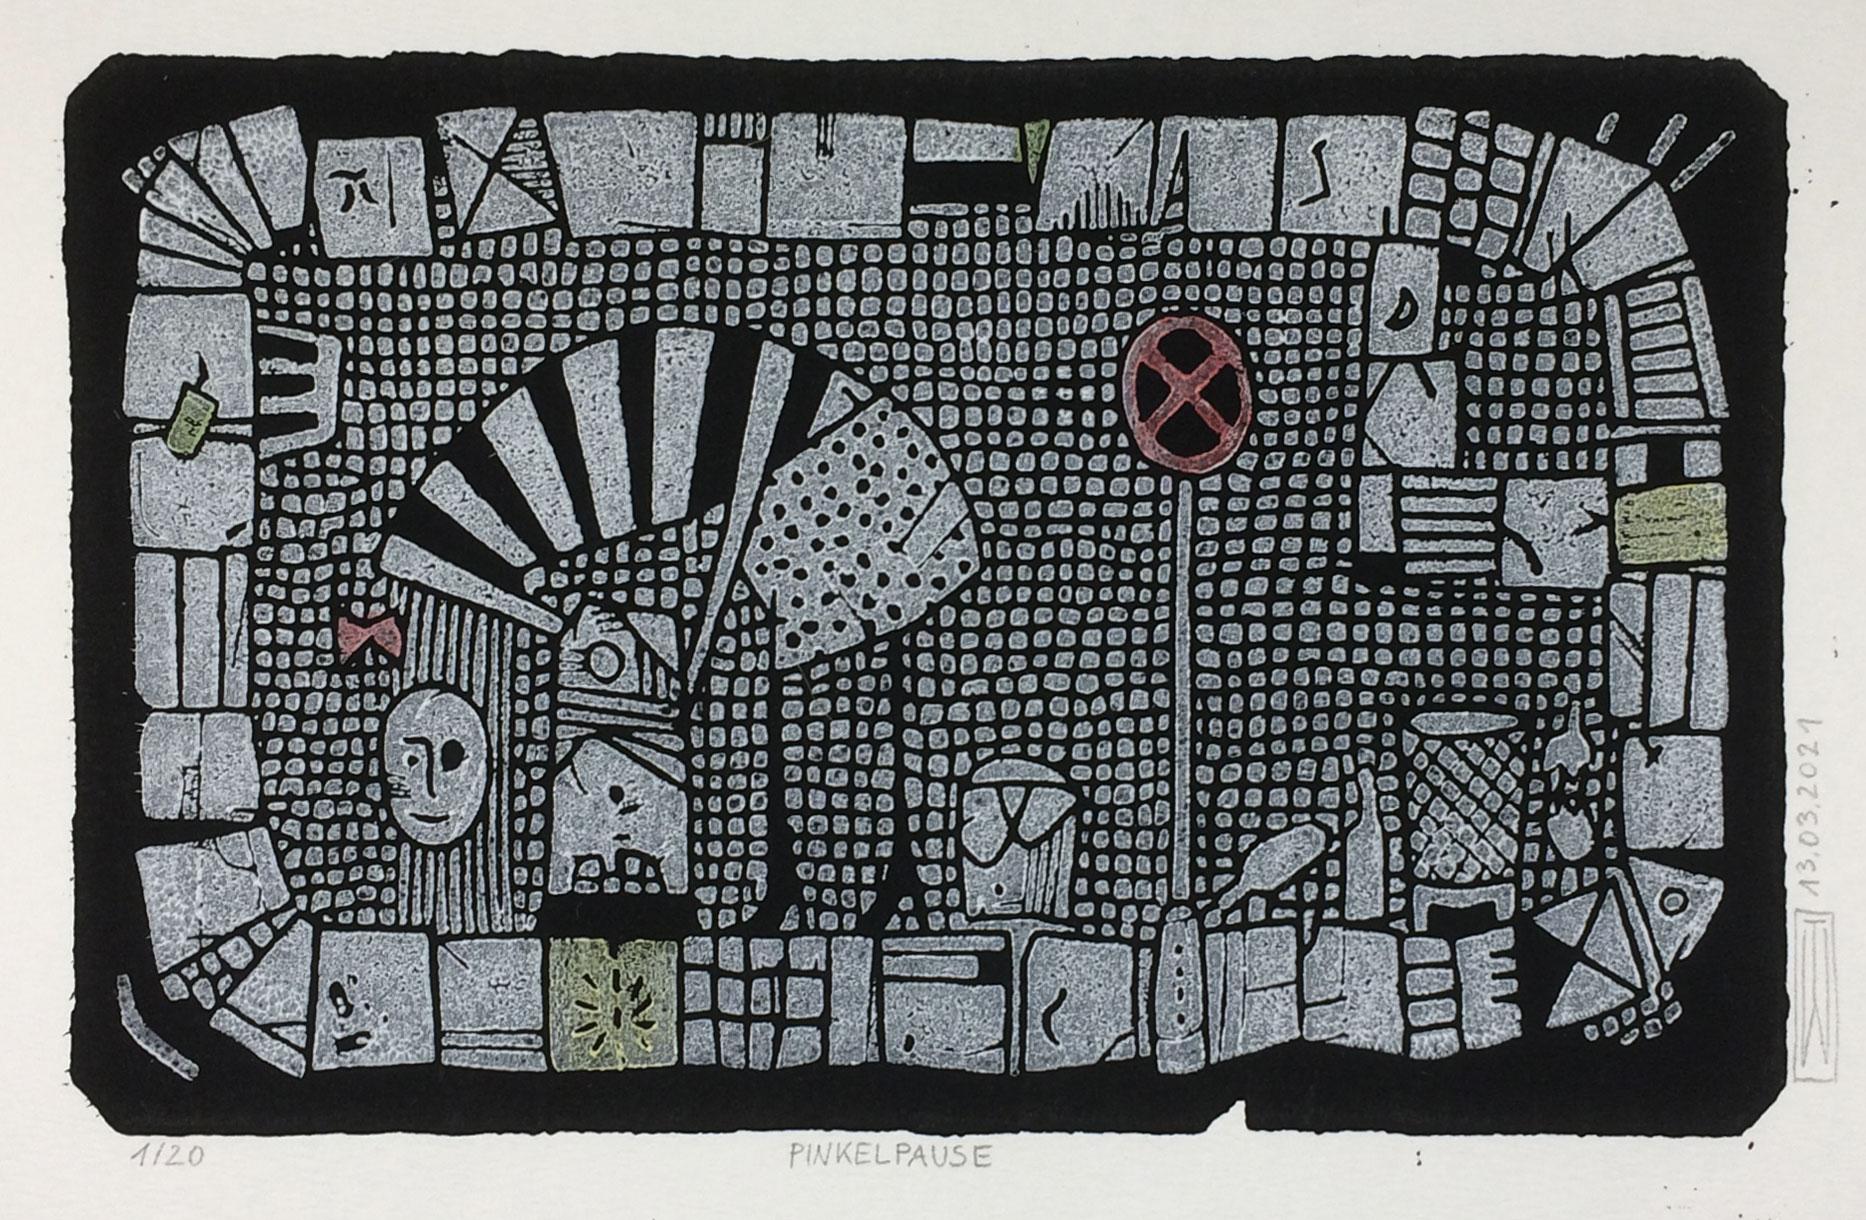 Pinkelpause, Linoldruck, 21 x 13 cm